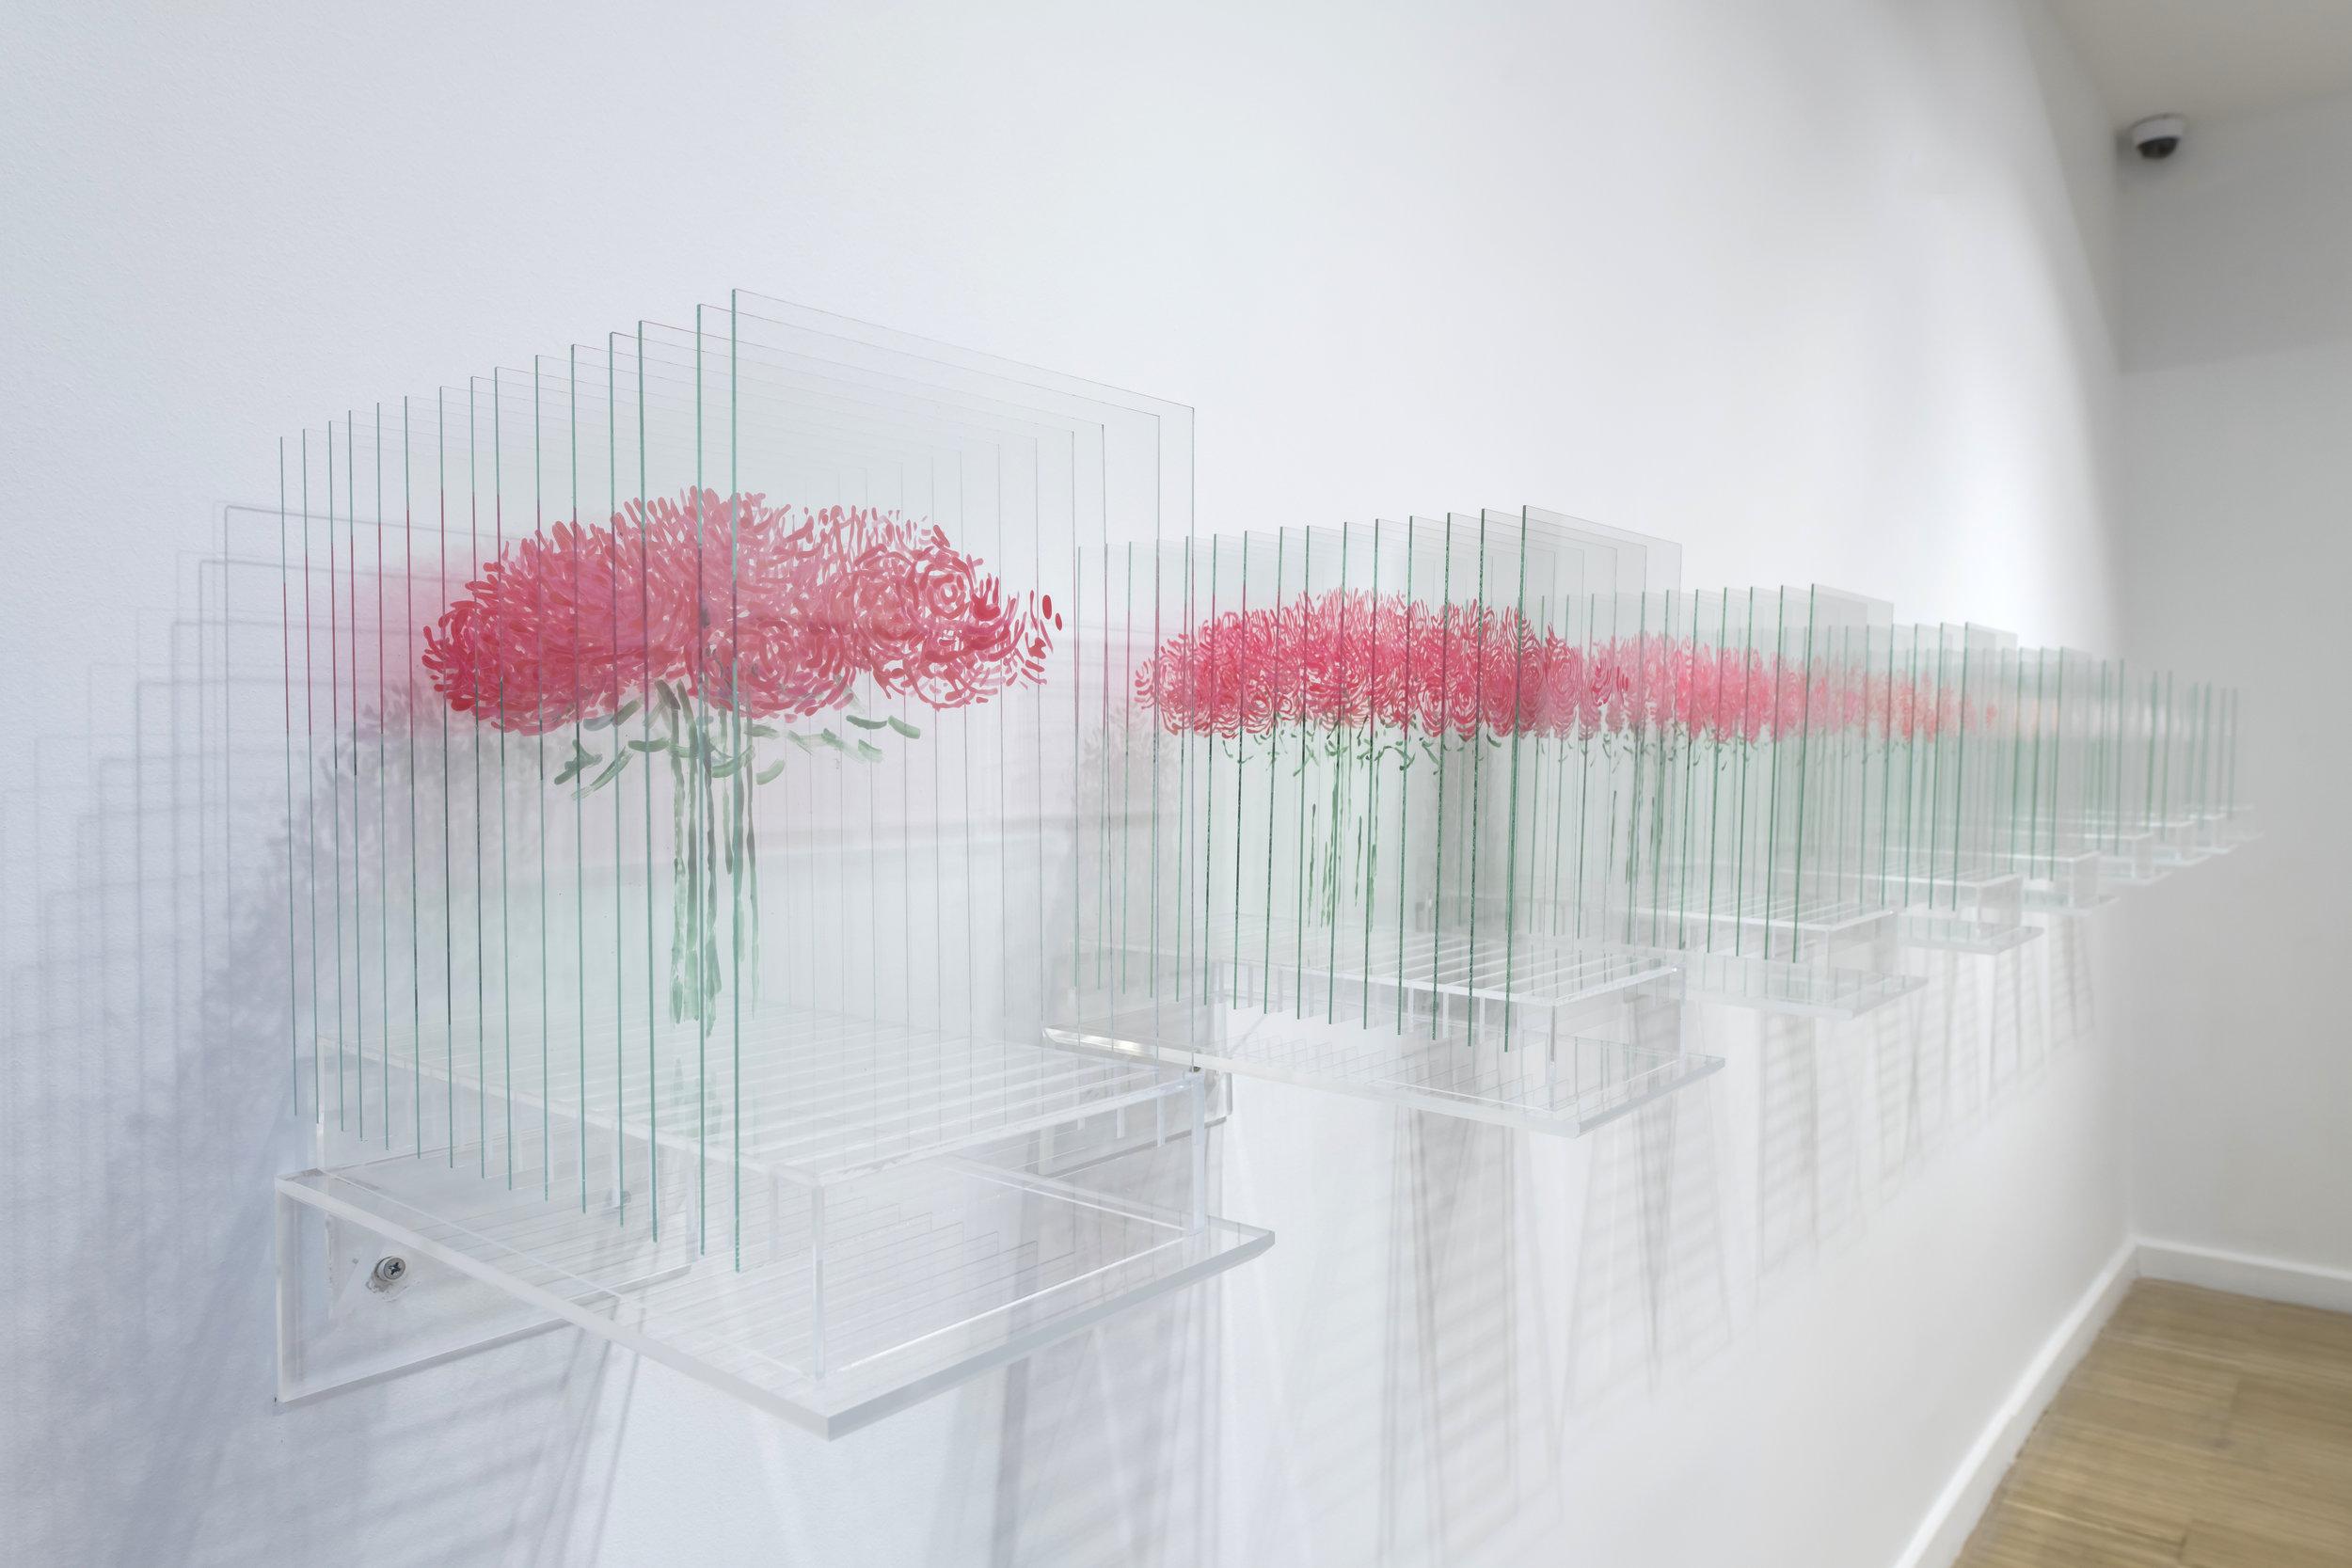 Ardan Özmenoglu,  Pantone Pink Rose 1-9 , 2018, Nail polish on 15 glass panels on plexi base, 13 x 8 x 15.5 in. each